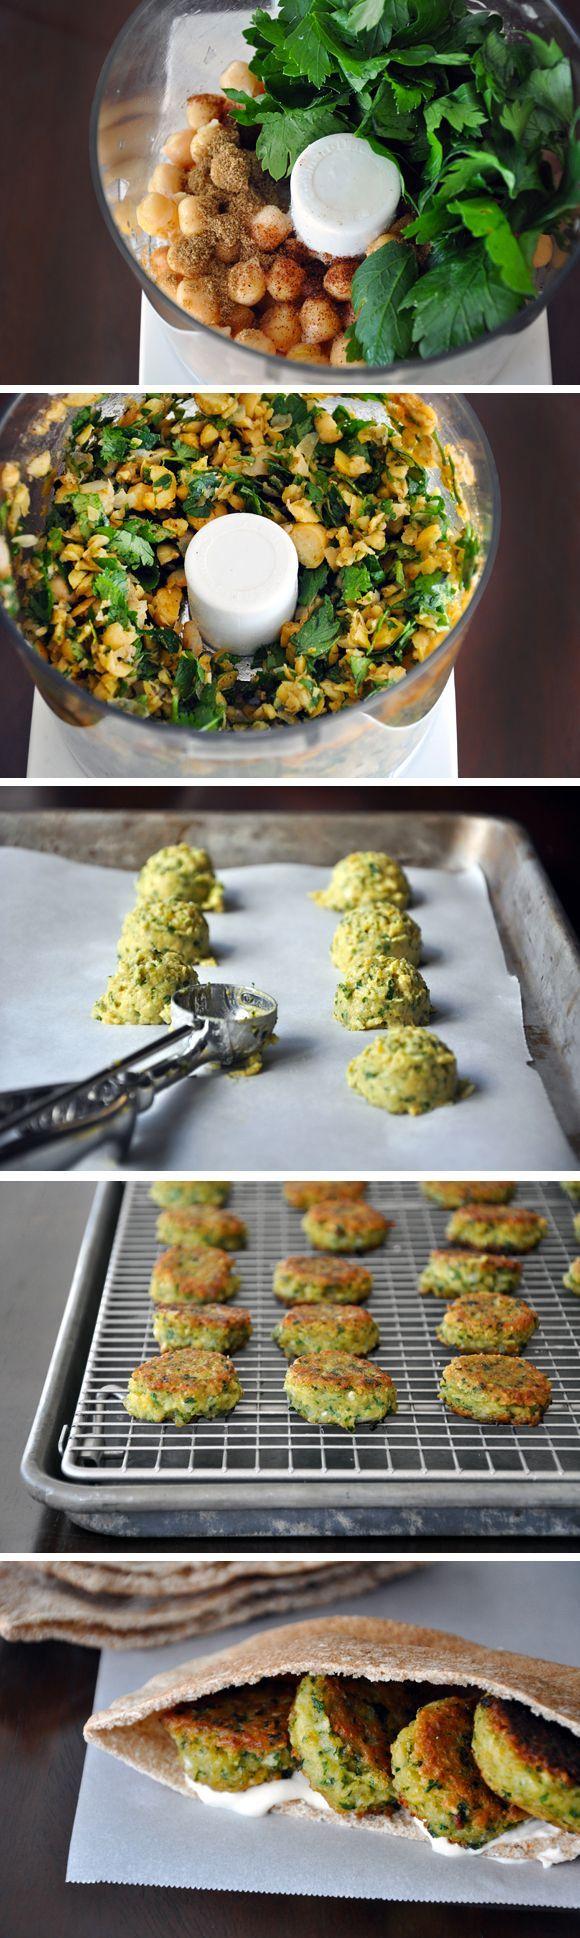 Homemade Falafel - Vegan. Click image for the recipe on justataste.com. Beautiful blog by the way! #vegan #vegetarian